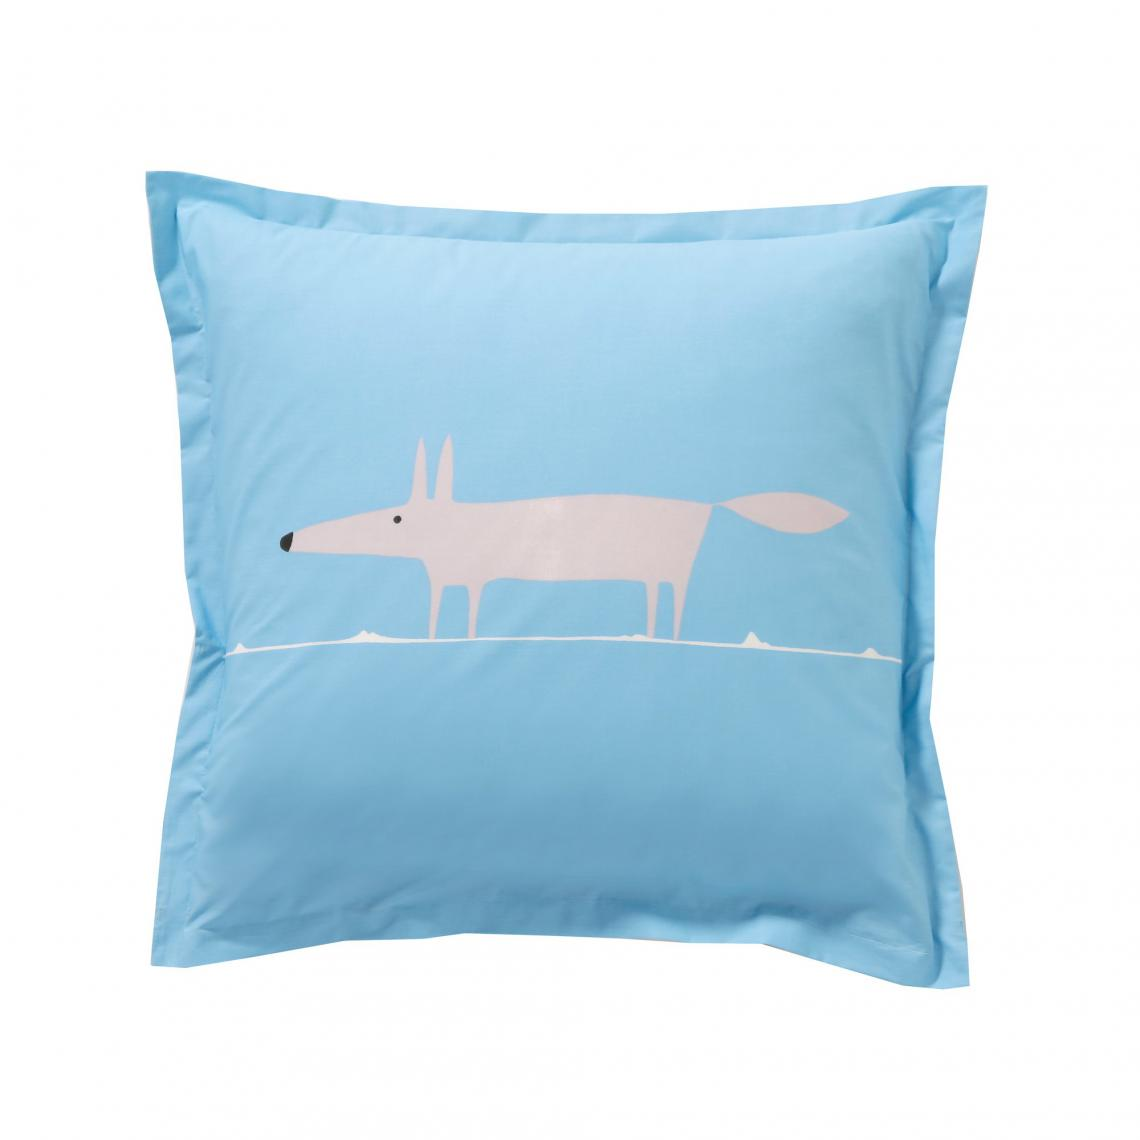 Scion living Mr Fox Taie Rectangle 50x75 cm Bleu Coton